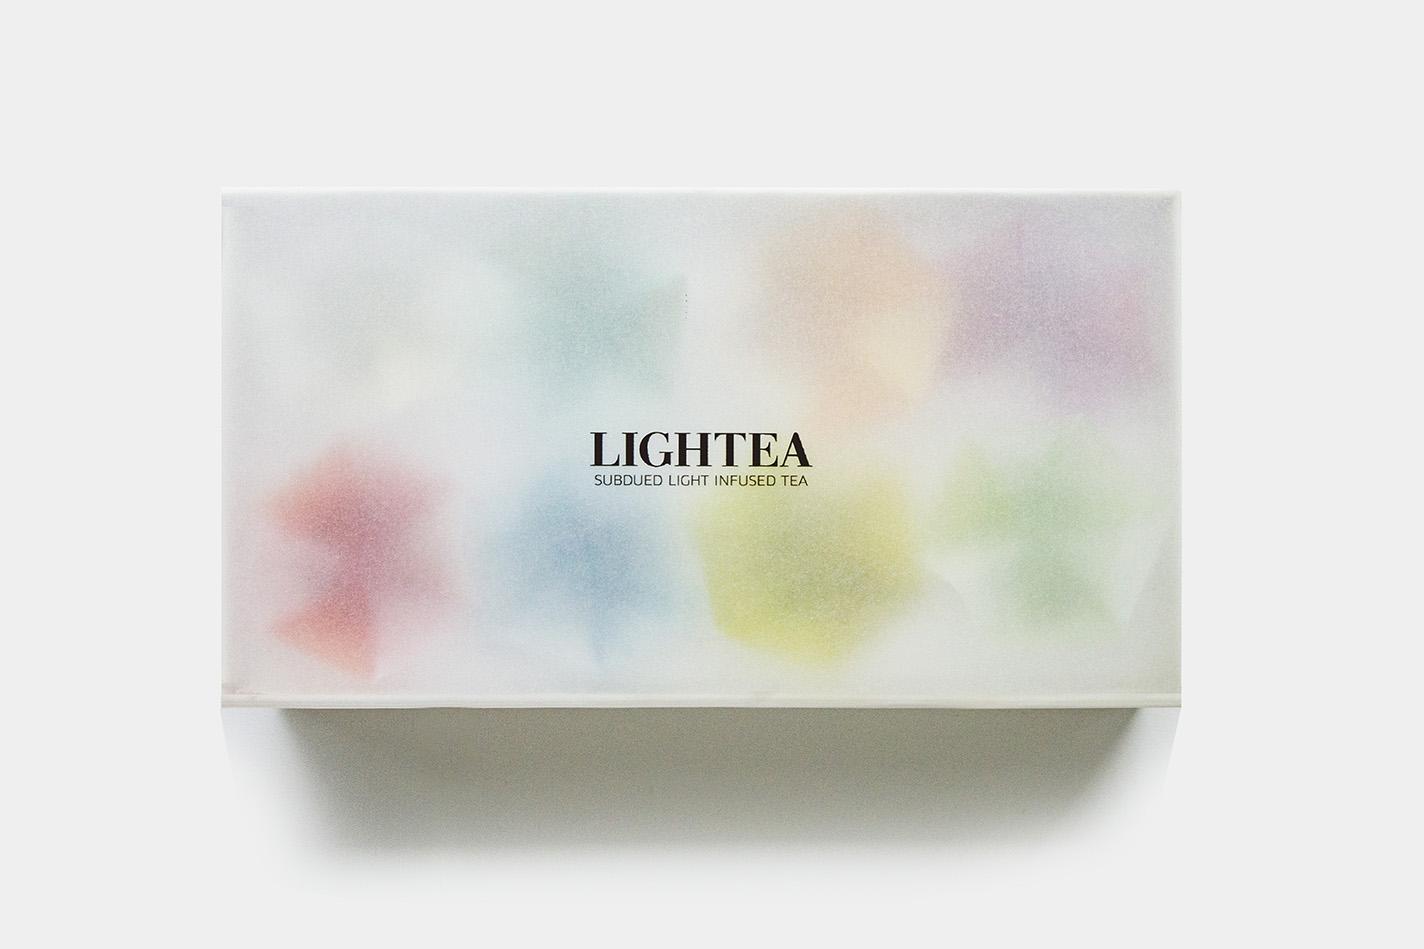 Lightea Chiese Tea Packaging Design